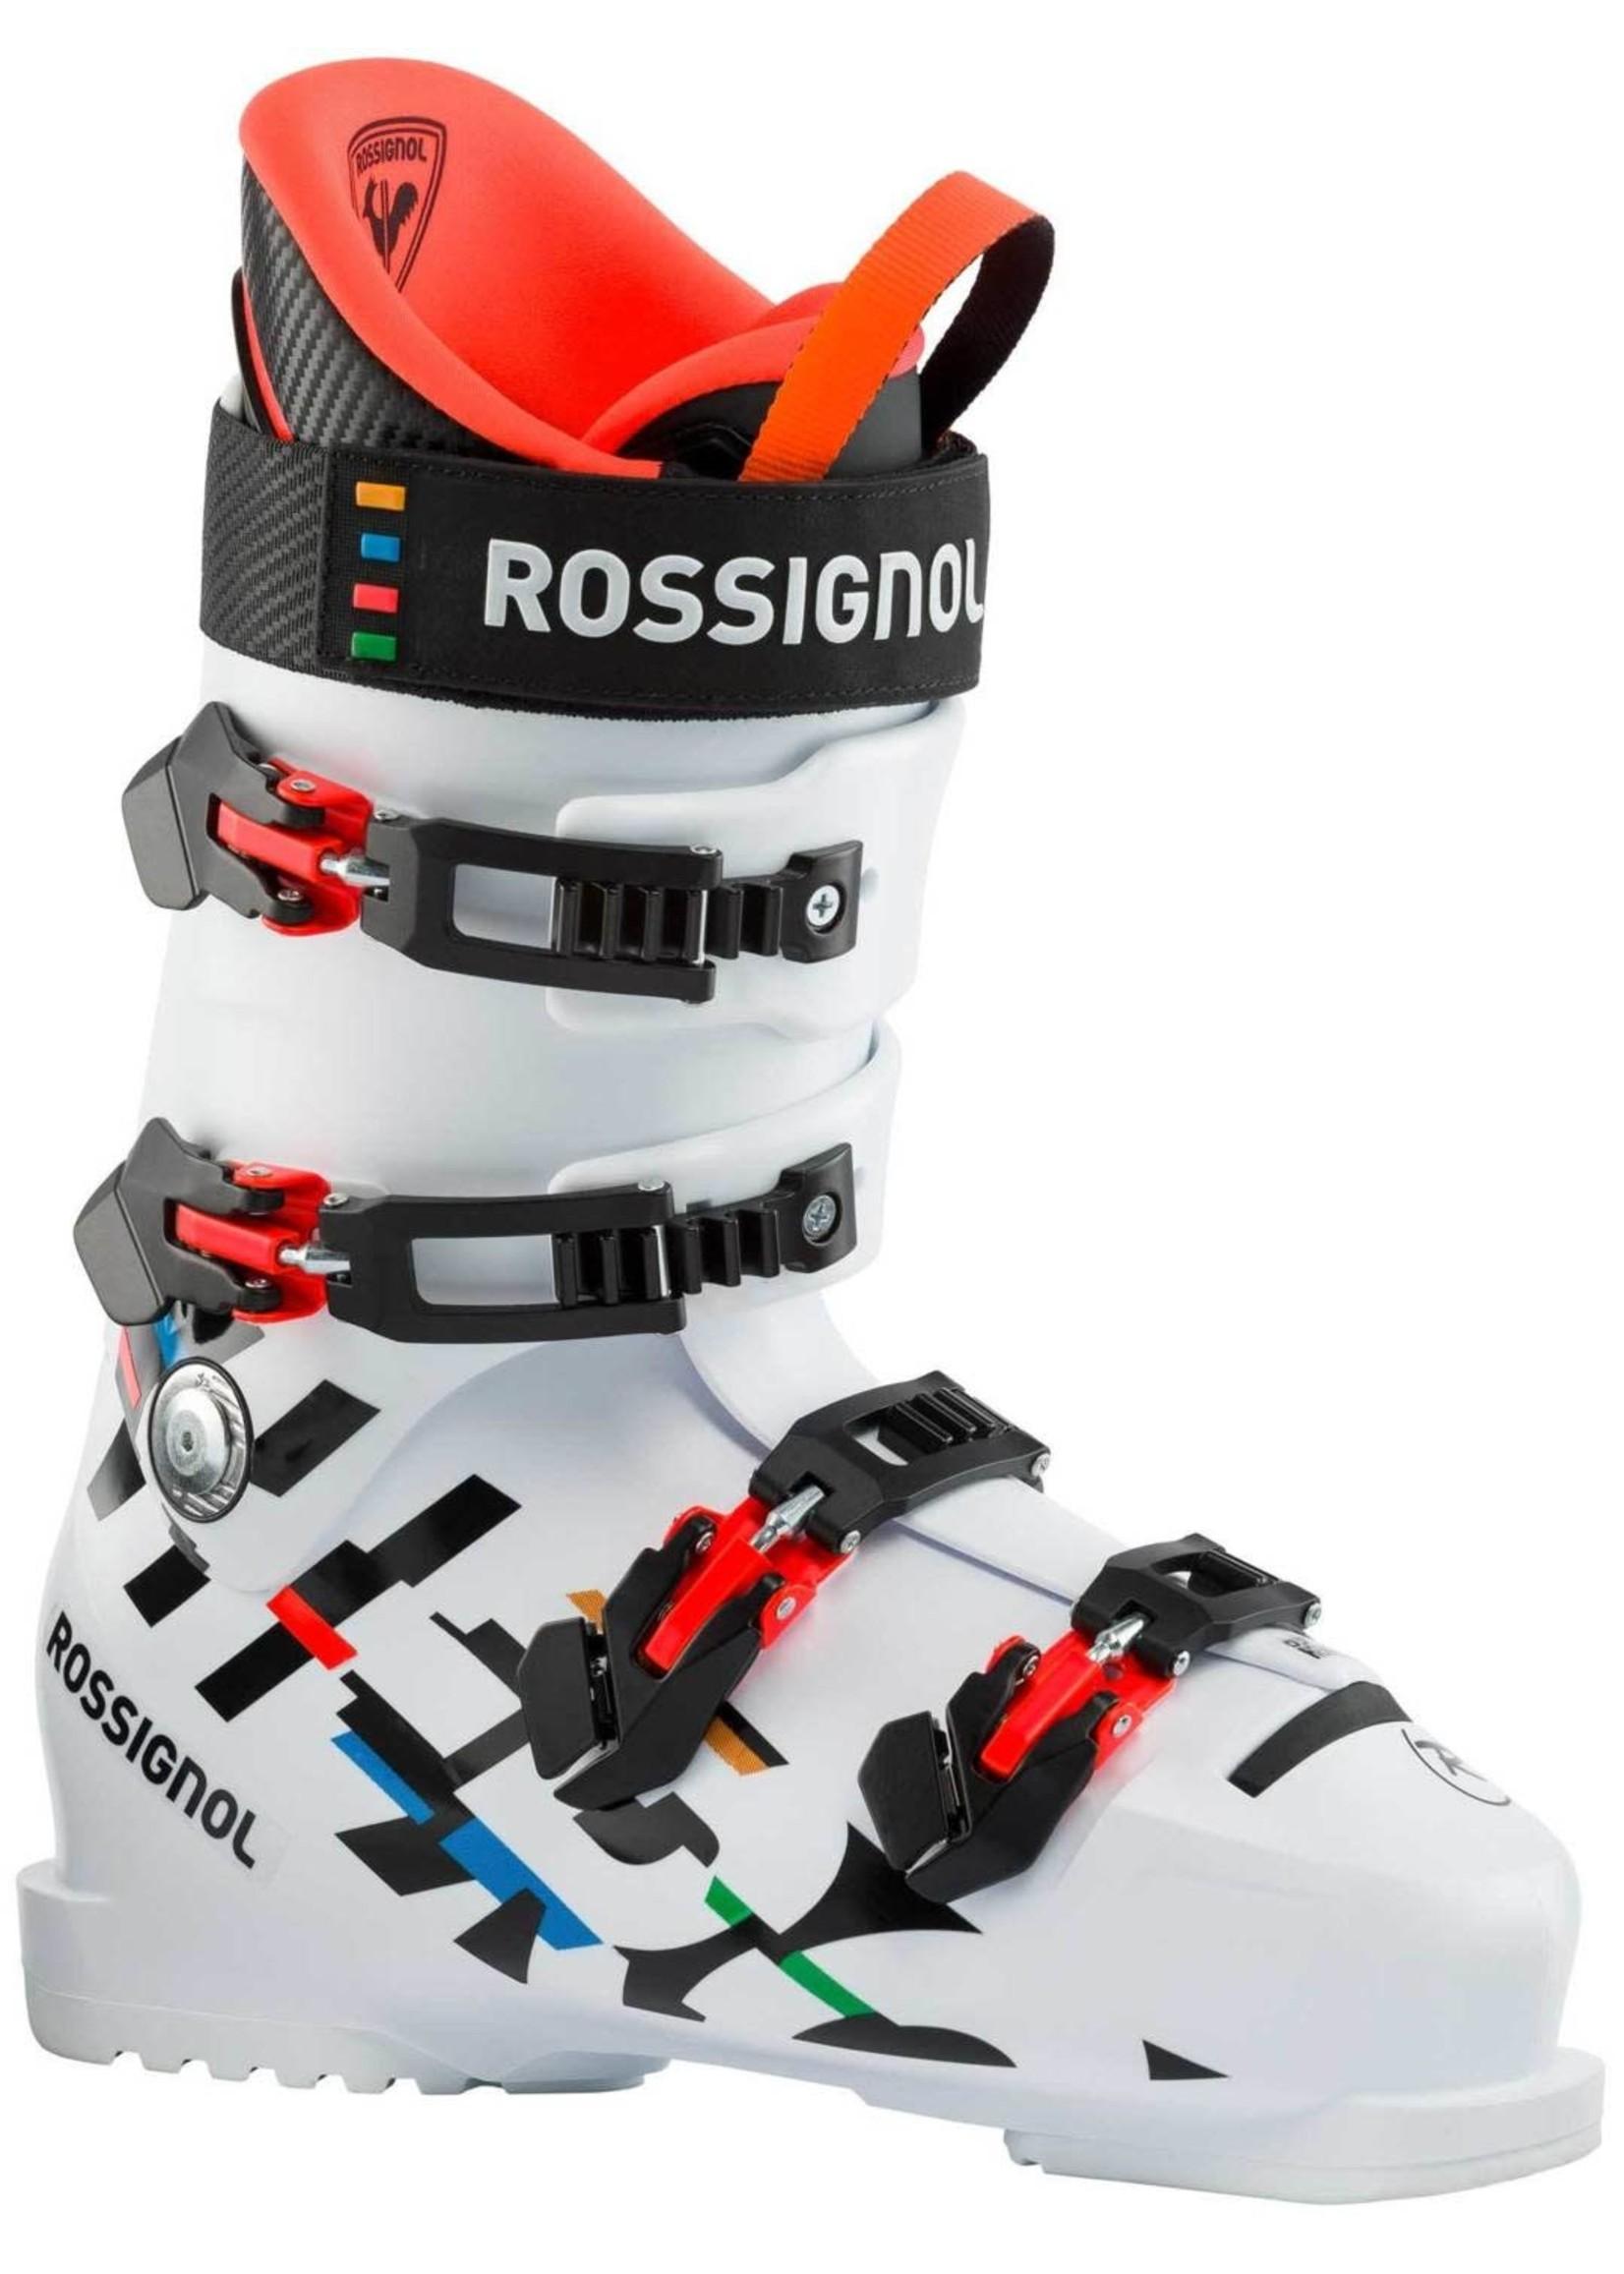 Rossignol HERO World Cup 110